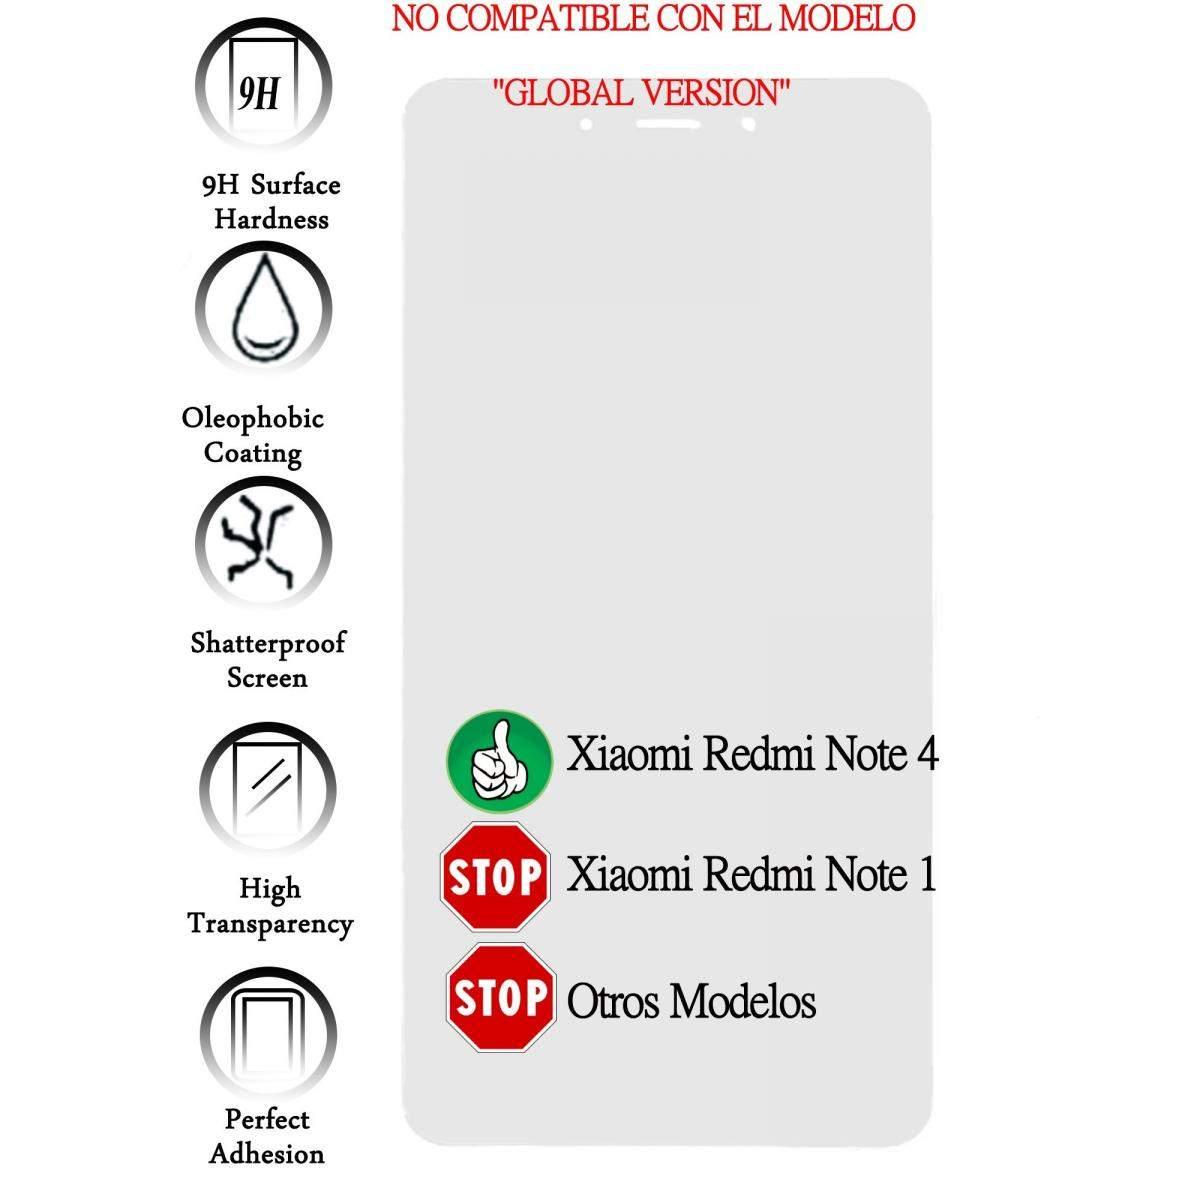 Kit-Protector-de-Pantalla-Cristal-Templado-Vidrio-para-Xiaomi-redmi-note-4